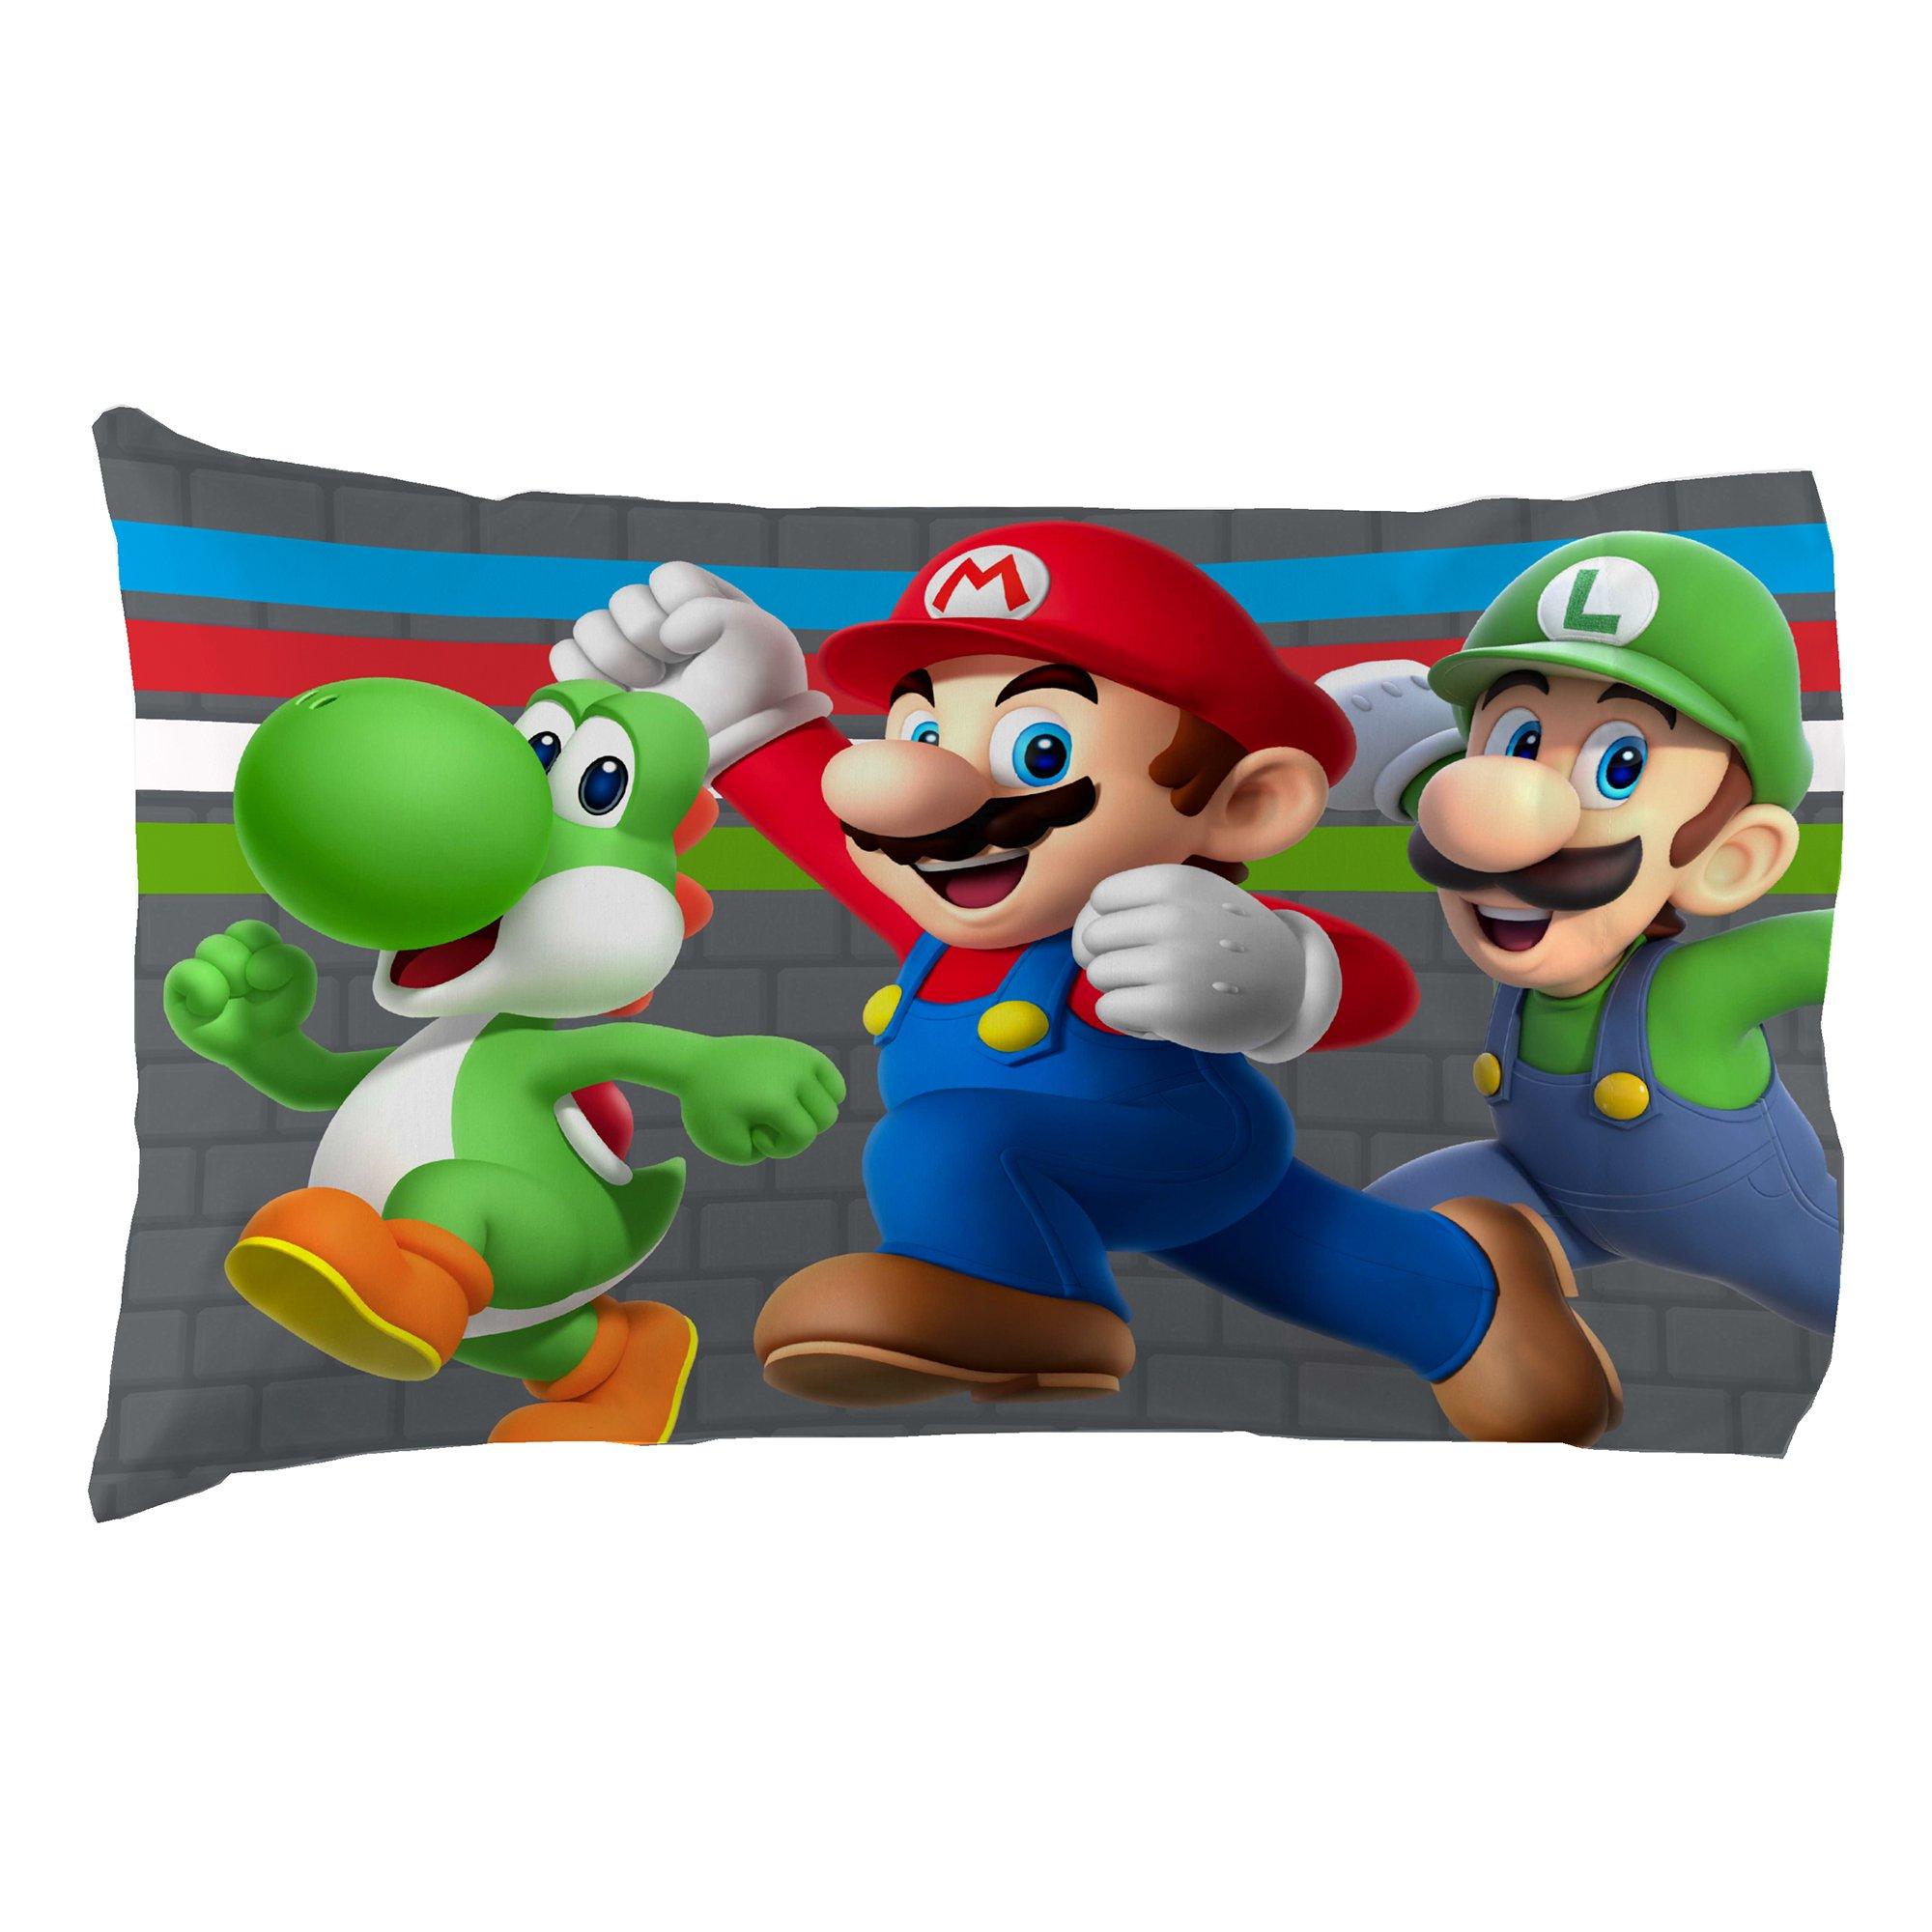 Nintendo Super Mario Trifecta Fun Twin Sheet Set by Nintendo (Image #4)